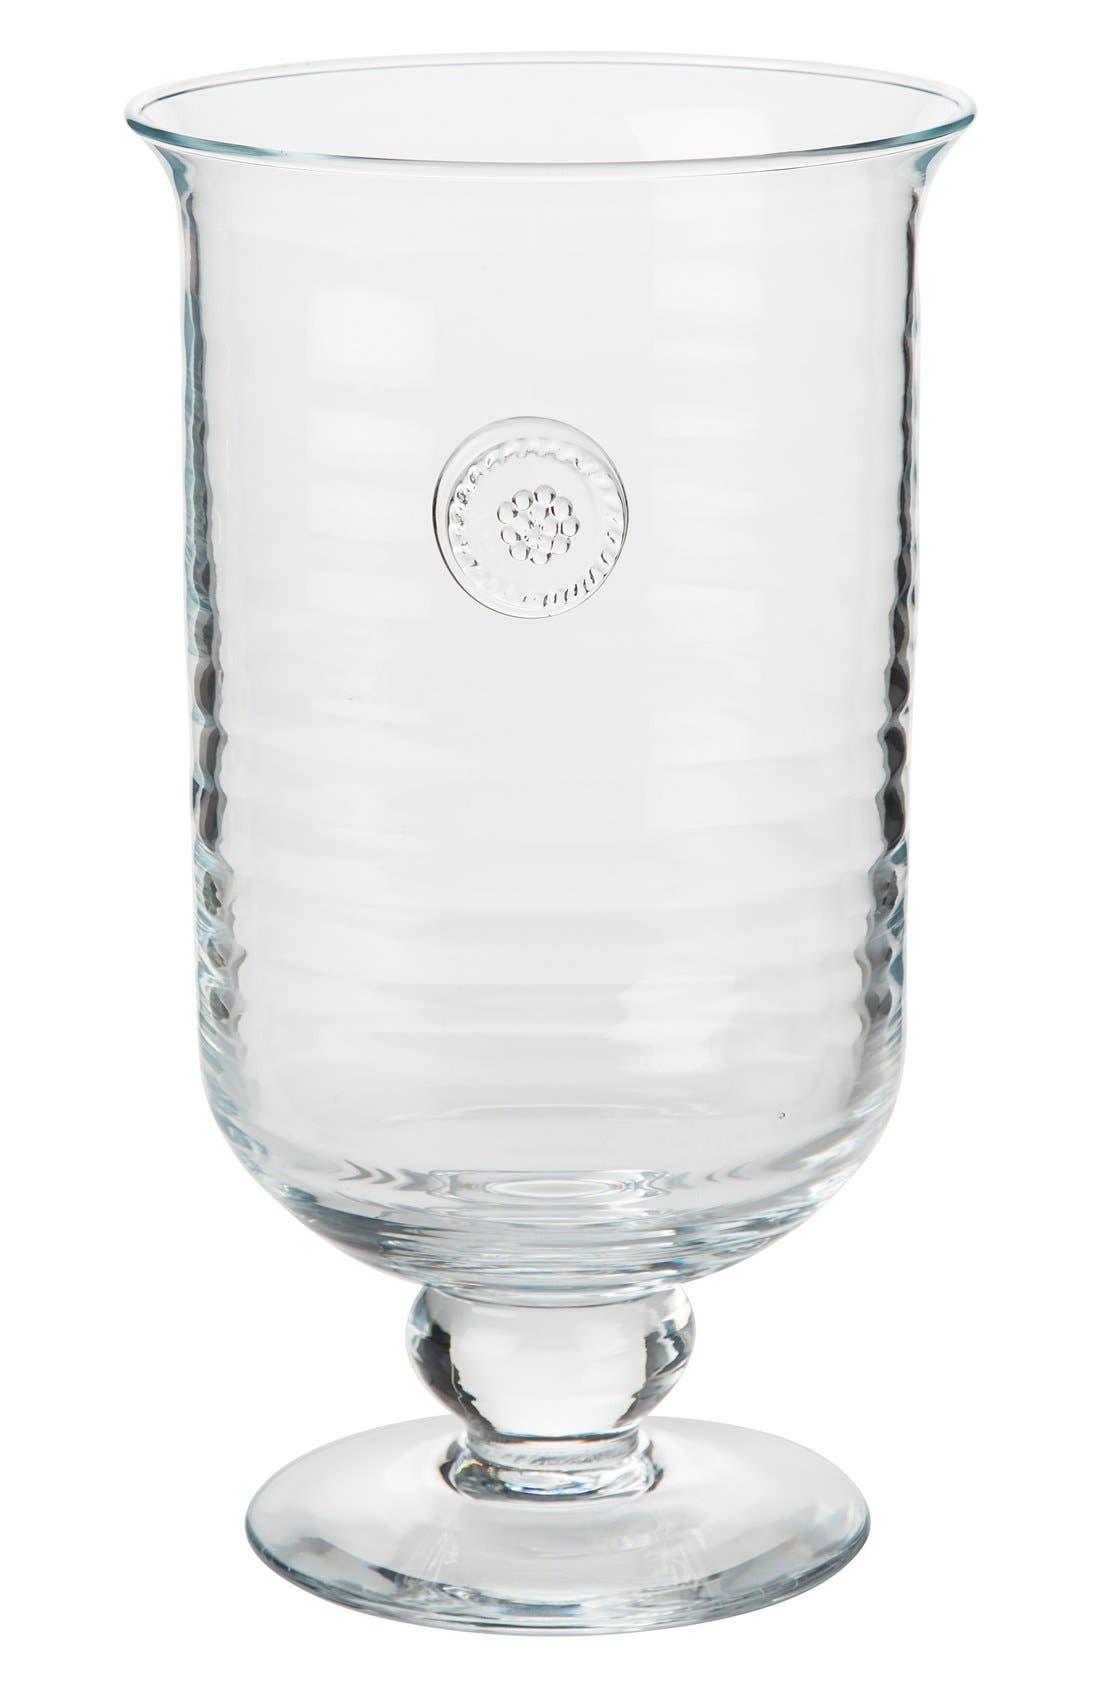 Berry & Thread Medium Hurricane Candleholder,                             Main thumbnail 1, color,                             CLEAR